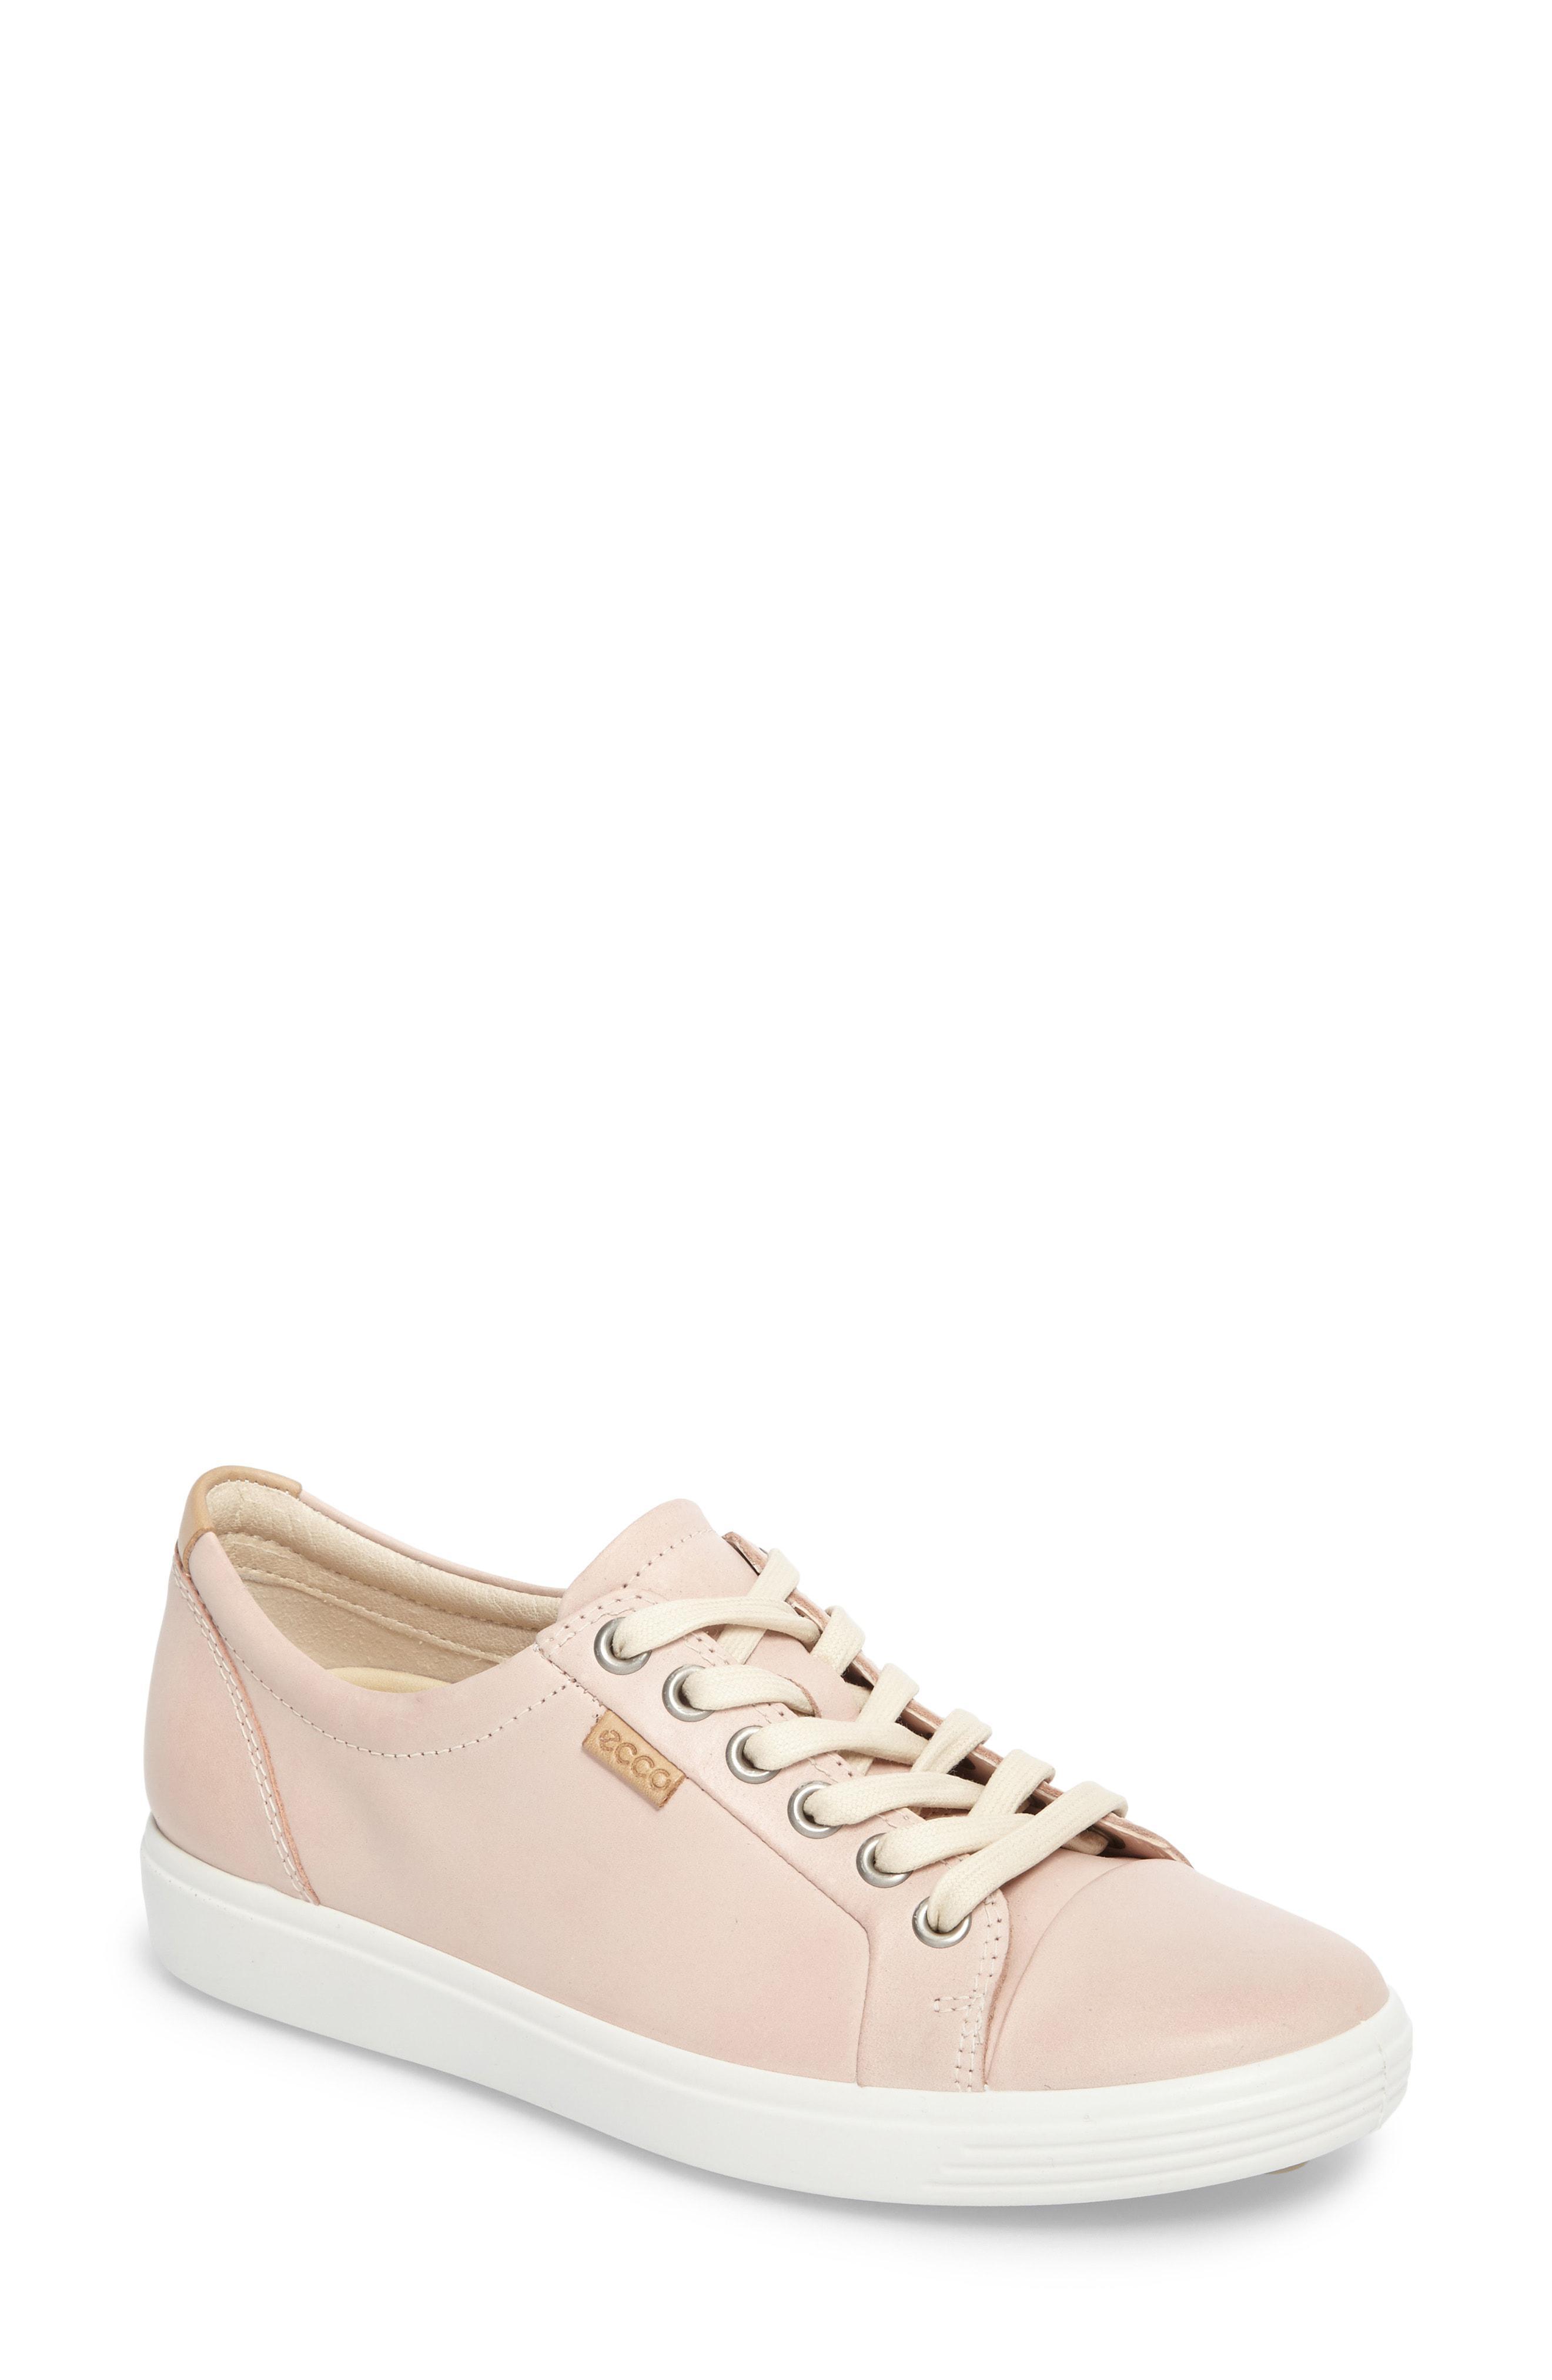 6b03609dd Ecco Soft 7 Sneaker in Pink - Lyst